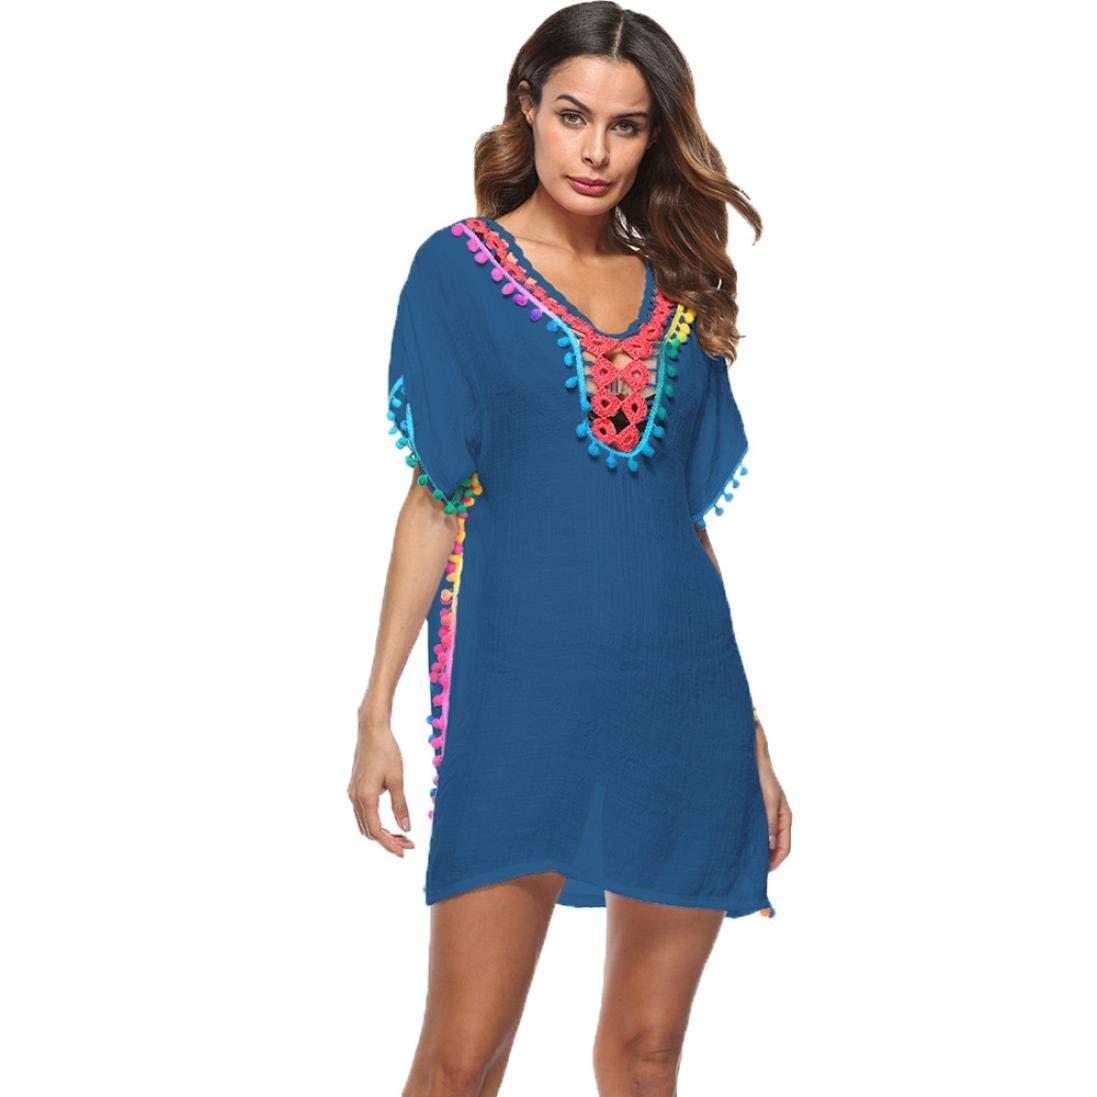 bluee Jianheads Women Tassel Swimsuit Bikini Stylish Beach Cover Up Sunscreen Shirt Bikini Smock Cover Up